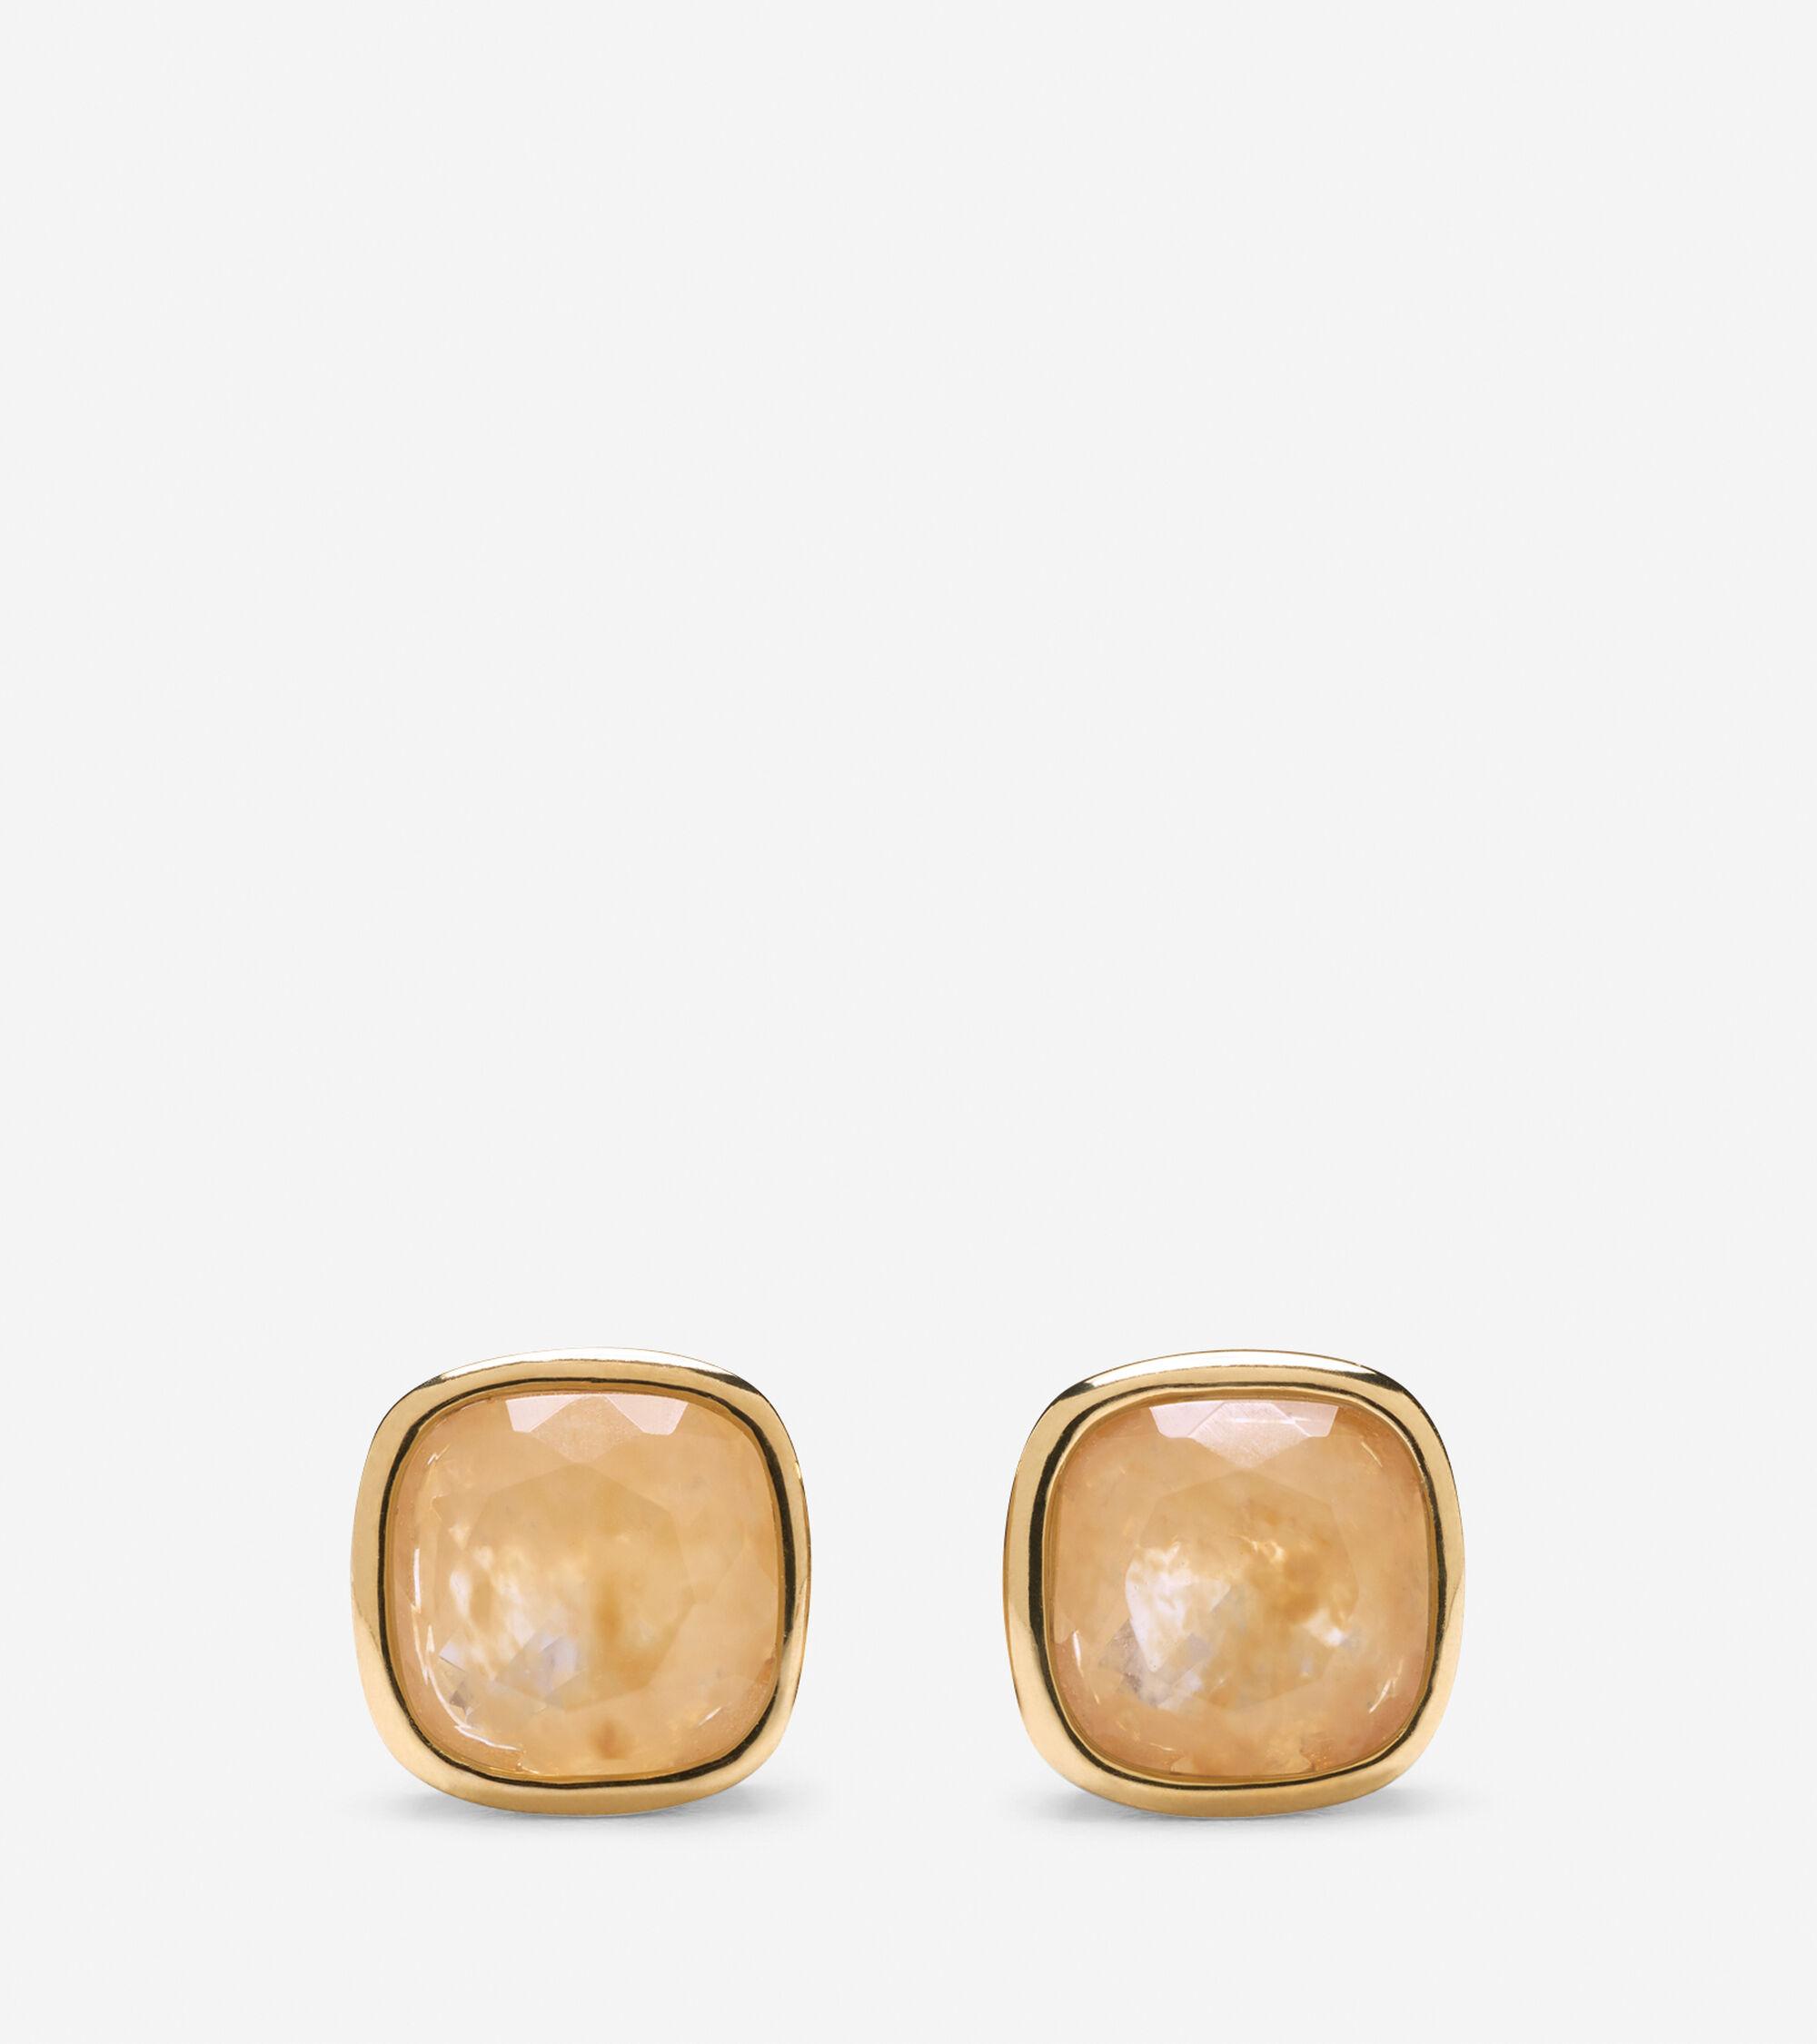 Accessories > Cushion Cut Rutilated Quartz Stud Earrings